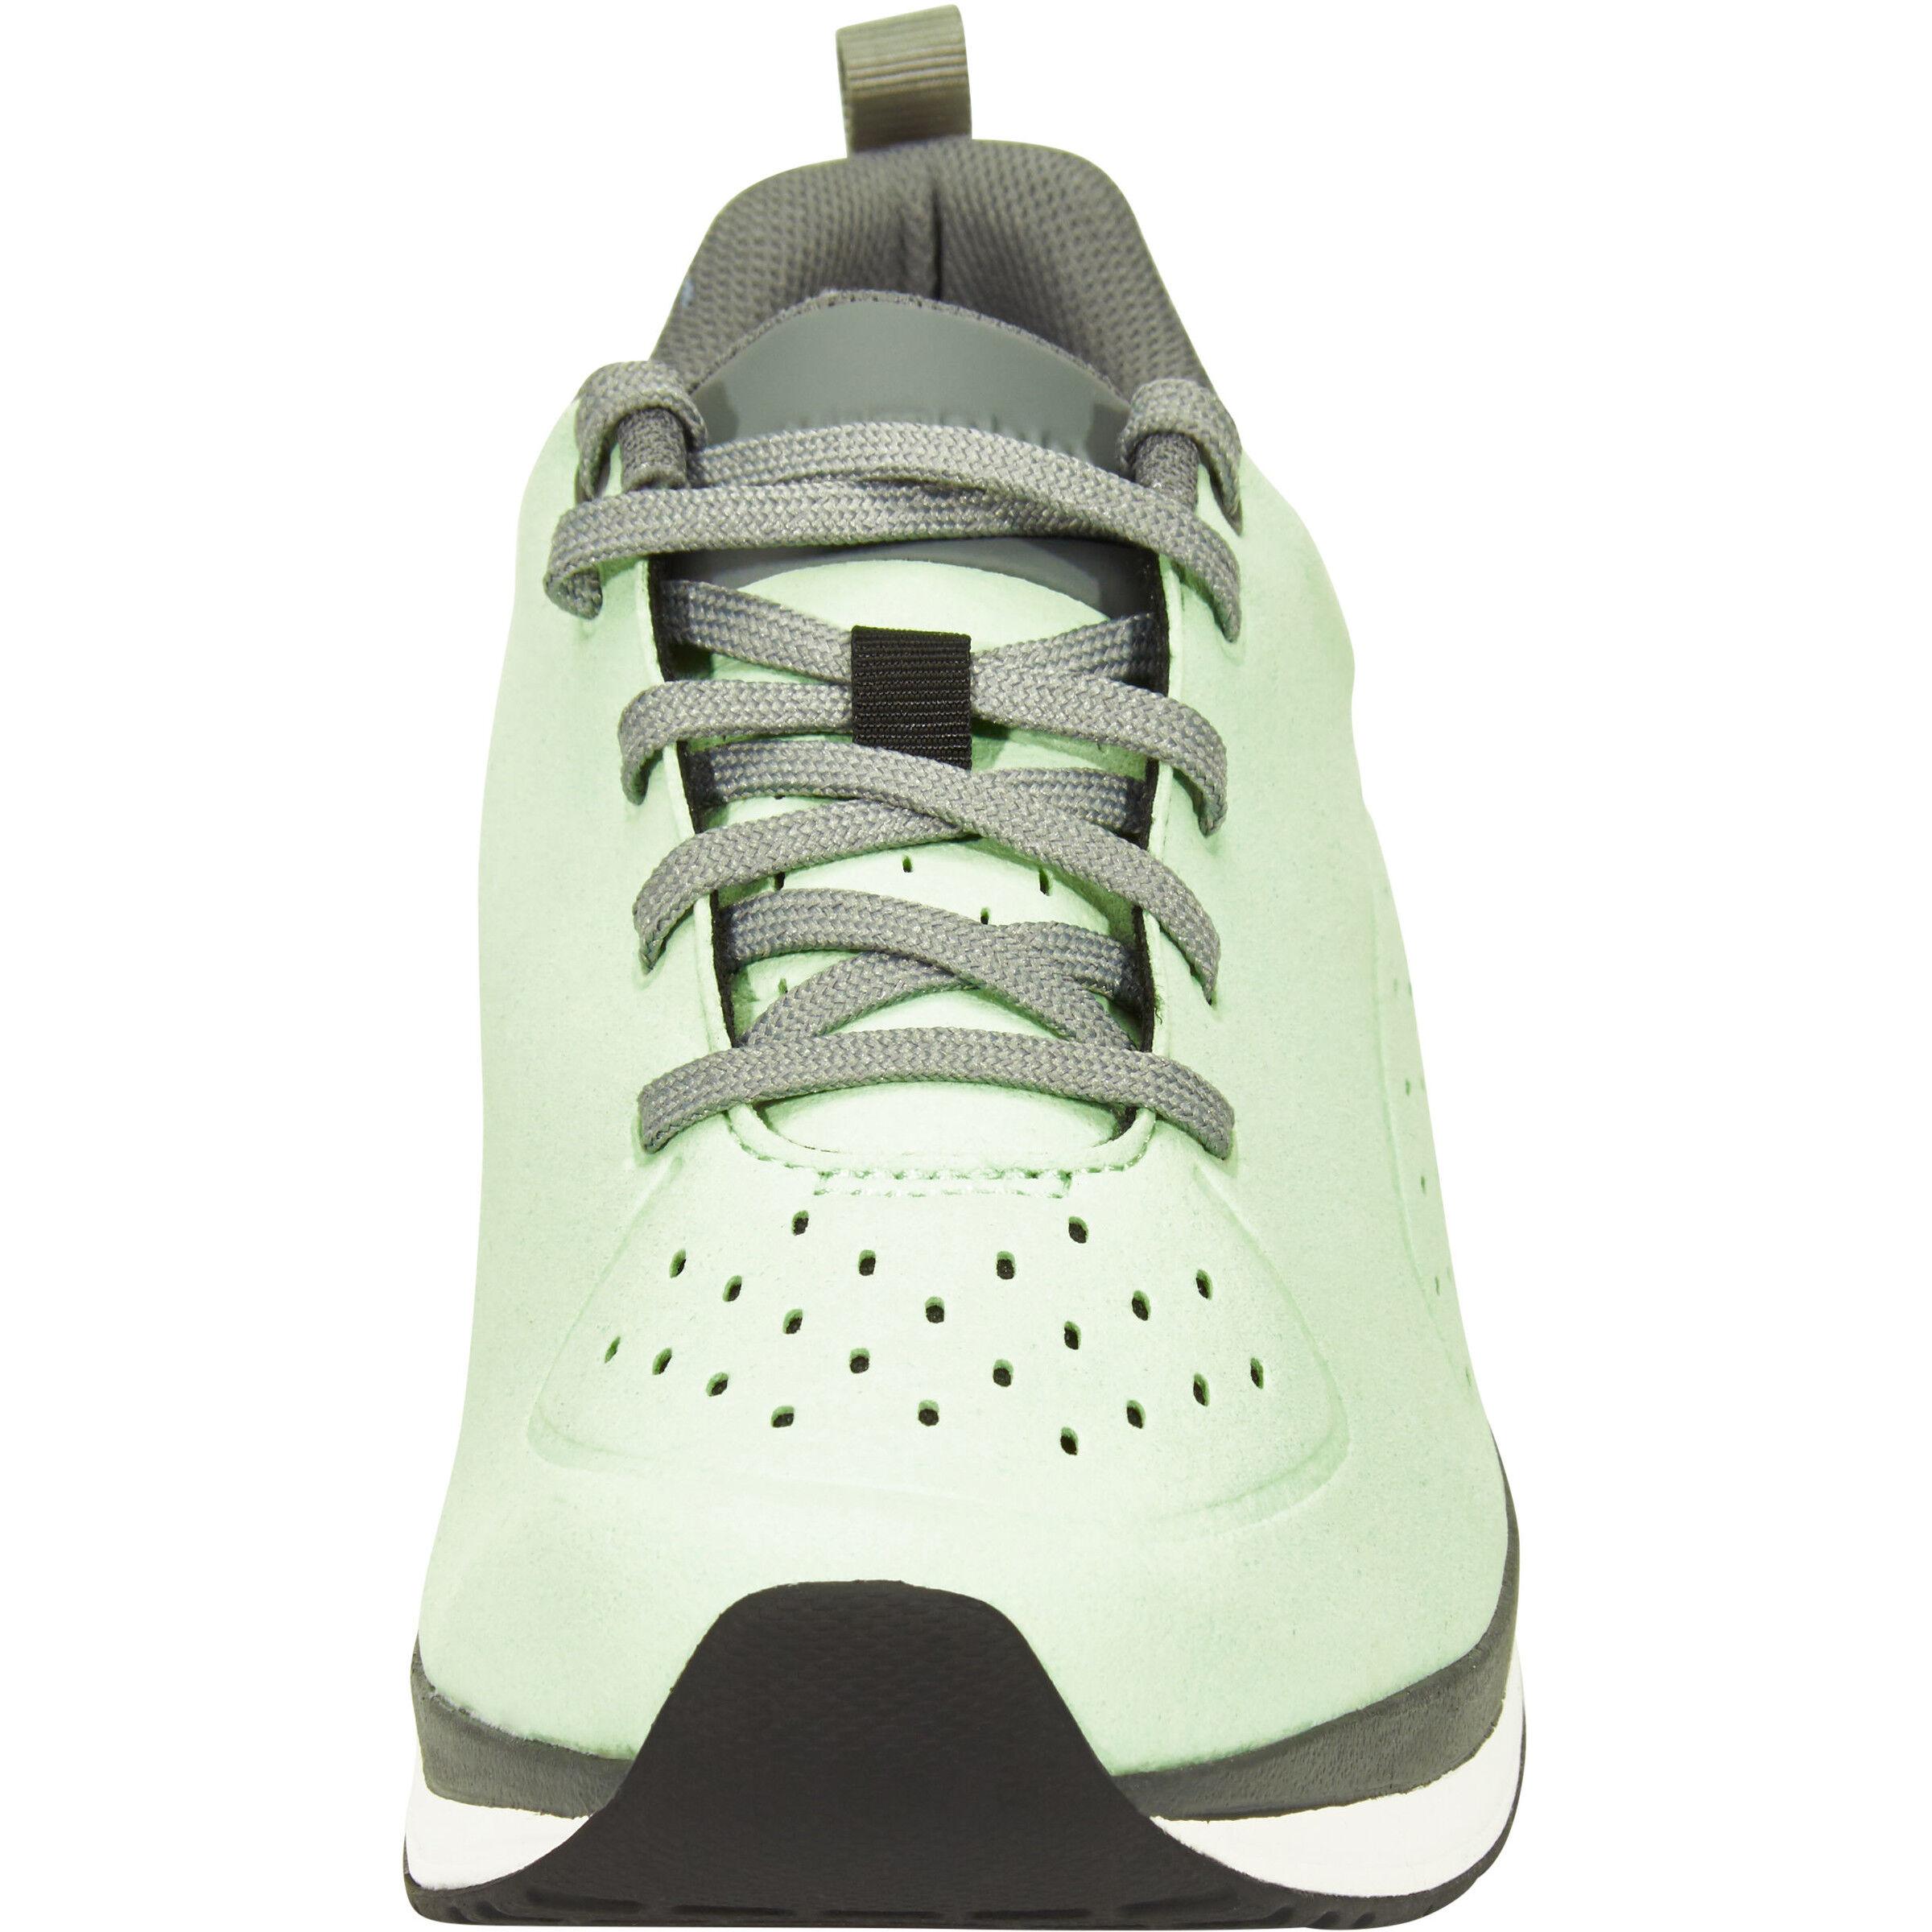 Shimano City Damen MTB Schuh SH CT5 online kaufen bei